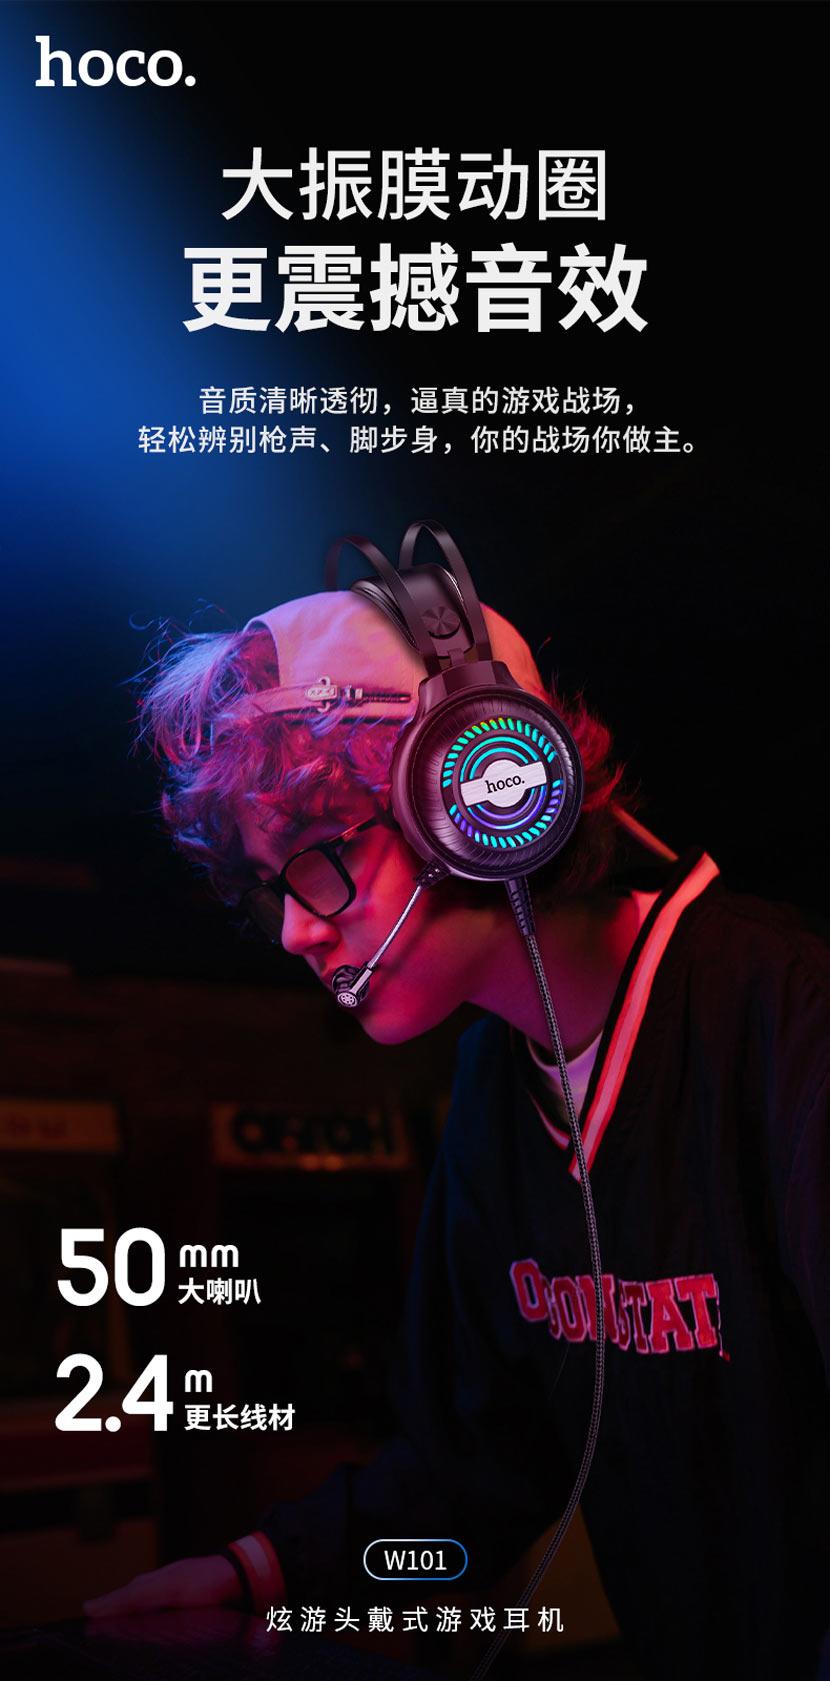 hoco news w101 streamer gaming headphones shocking cn